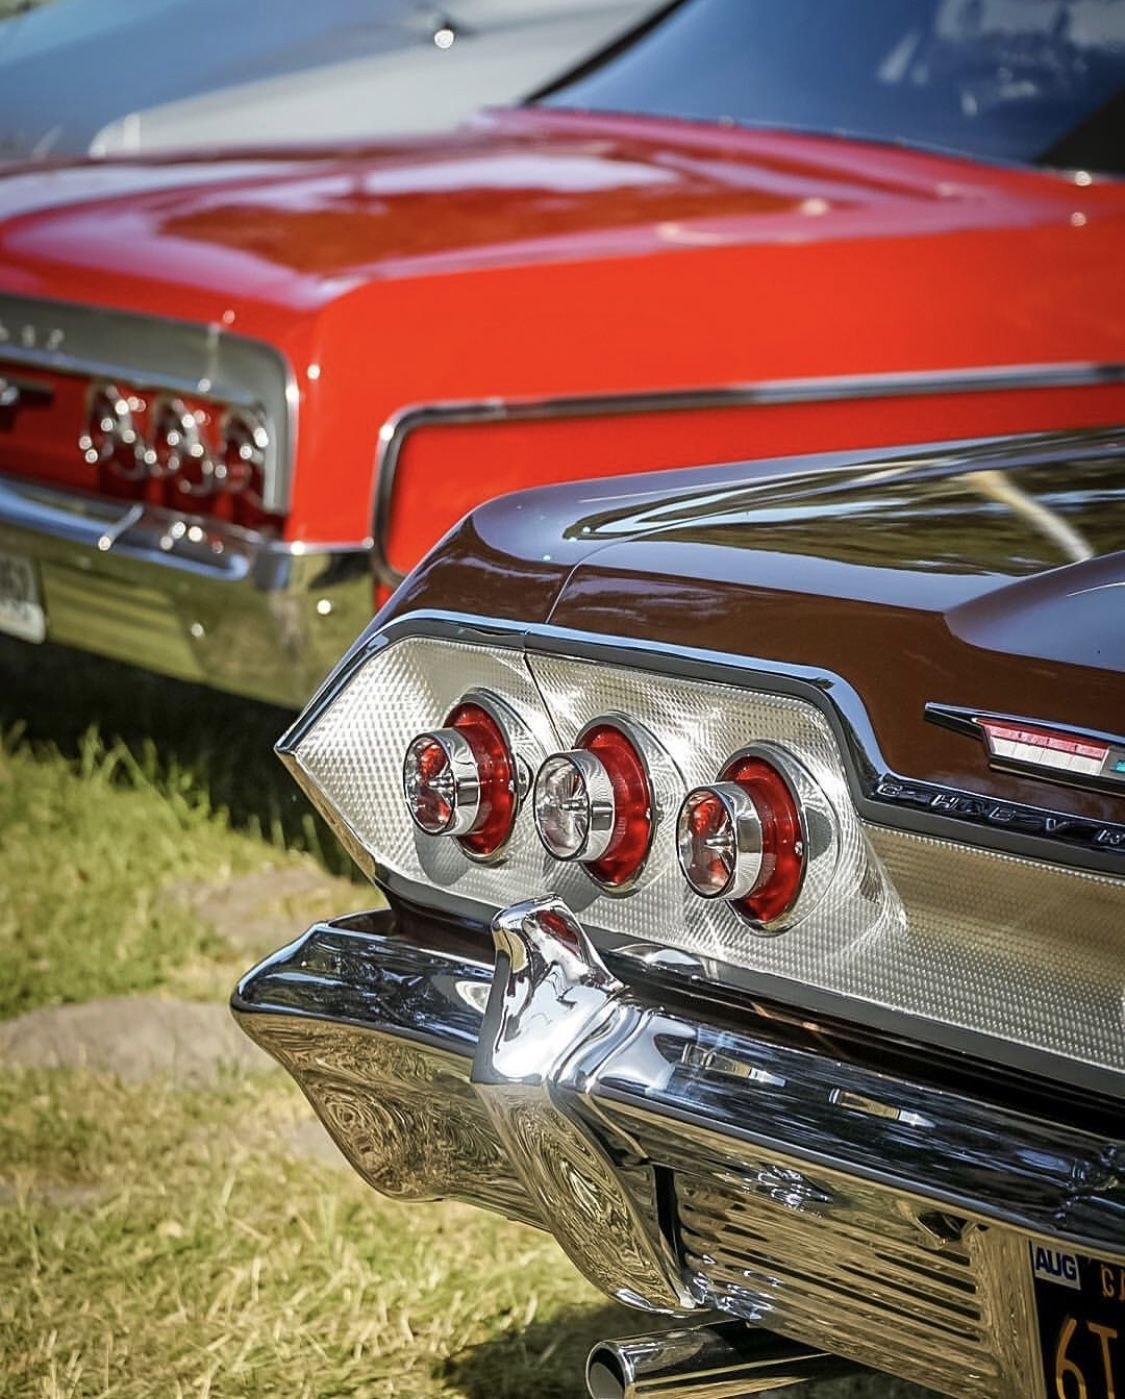 Pin By Juan Ramon Reyes On 1956 1957 1958 1959 1960 1961 1962 1963 1964 Chevrolet Chevrolet Impala 1963 Chevrolet Impala Chevy Impala